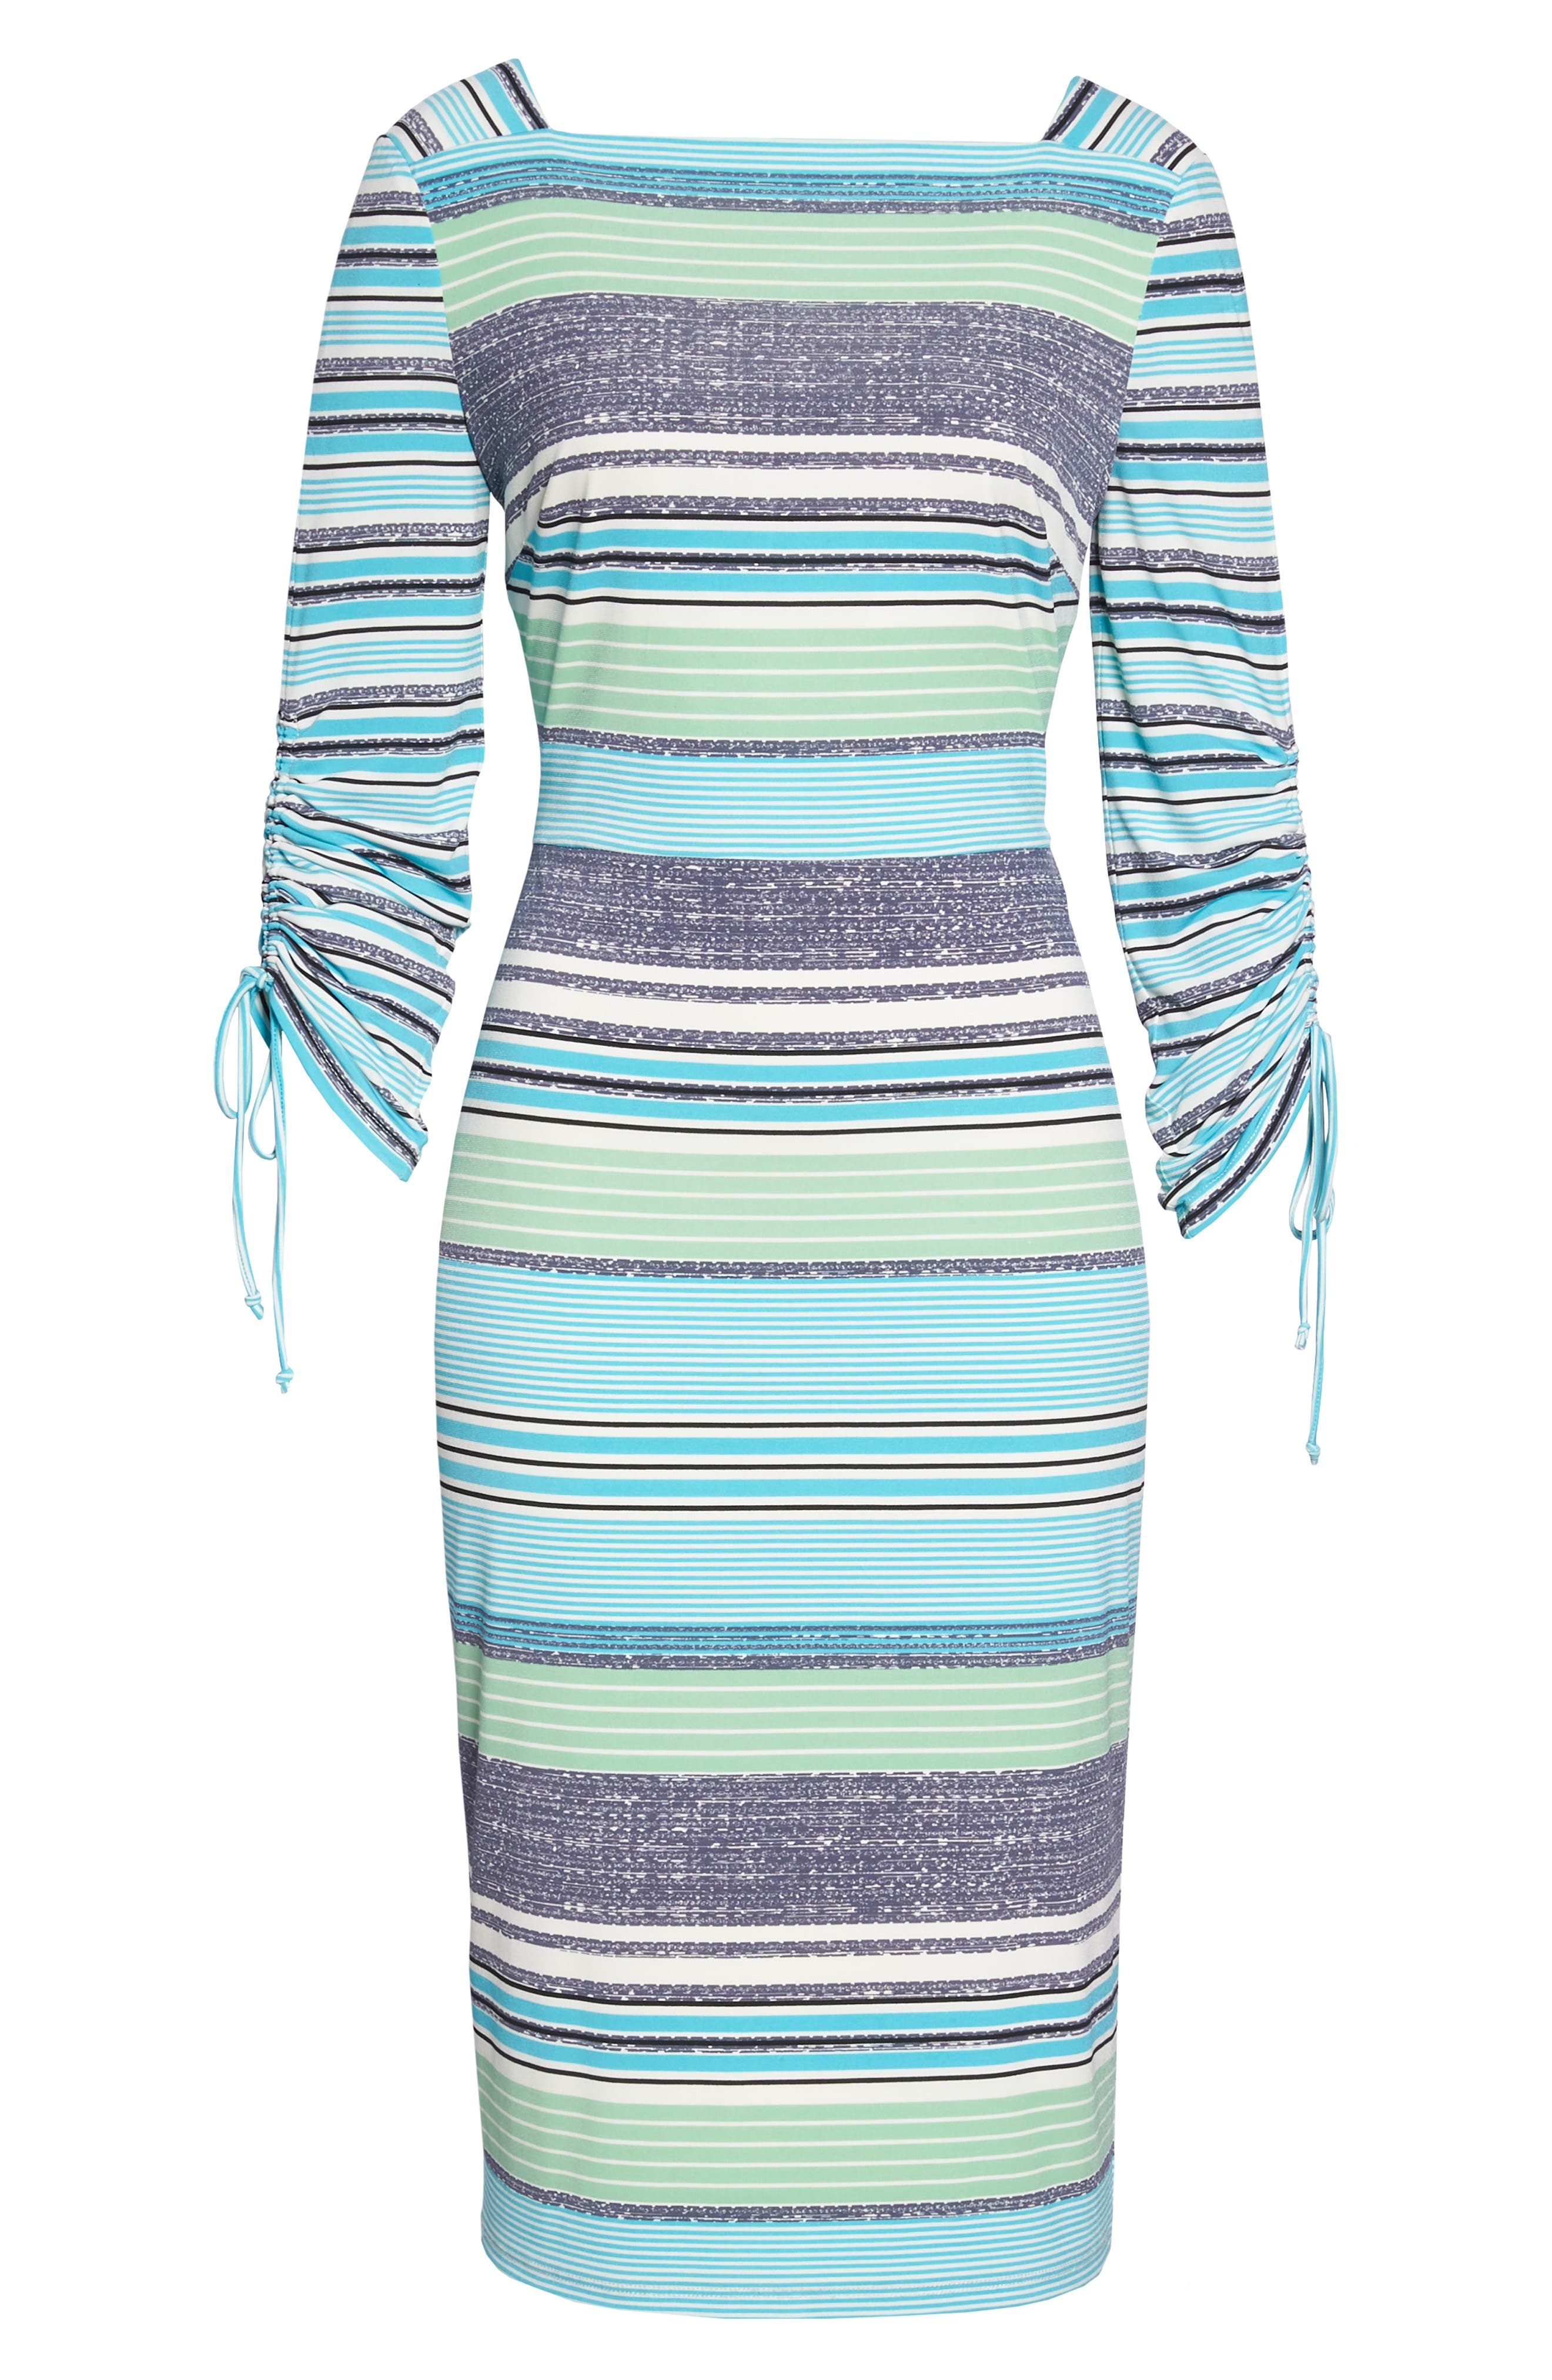 Ruched Sleeve Sheath Dress,                             Alternate thumbnail 7, color,                             White/ Aqua